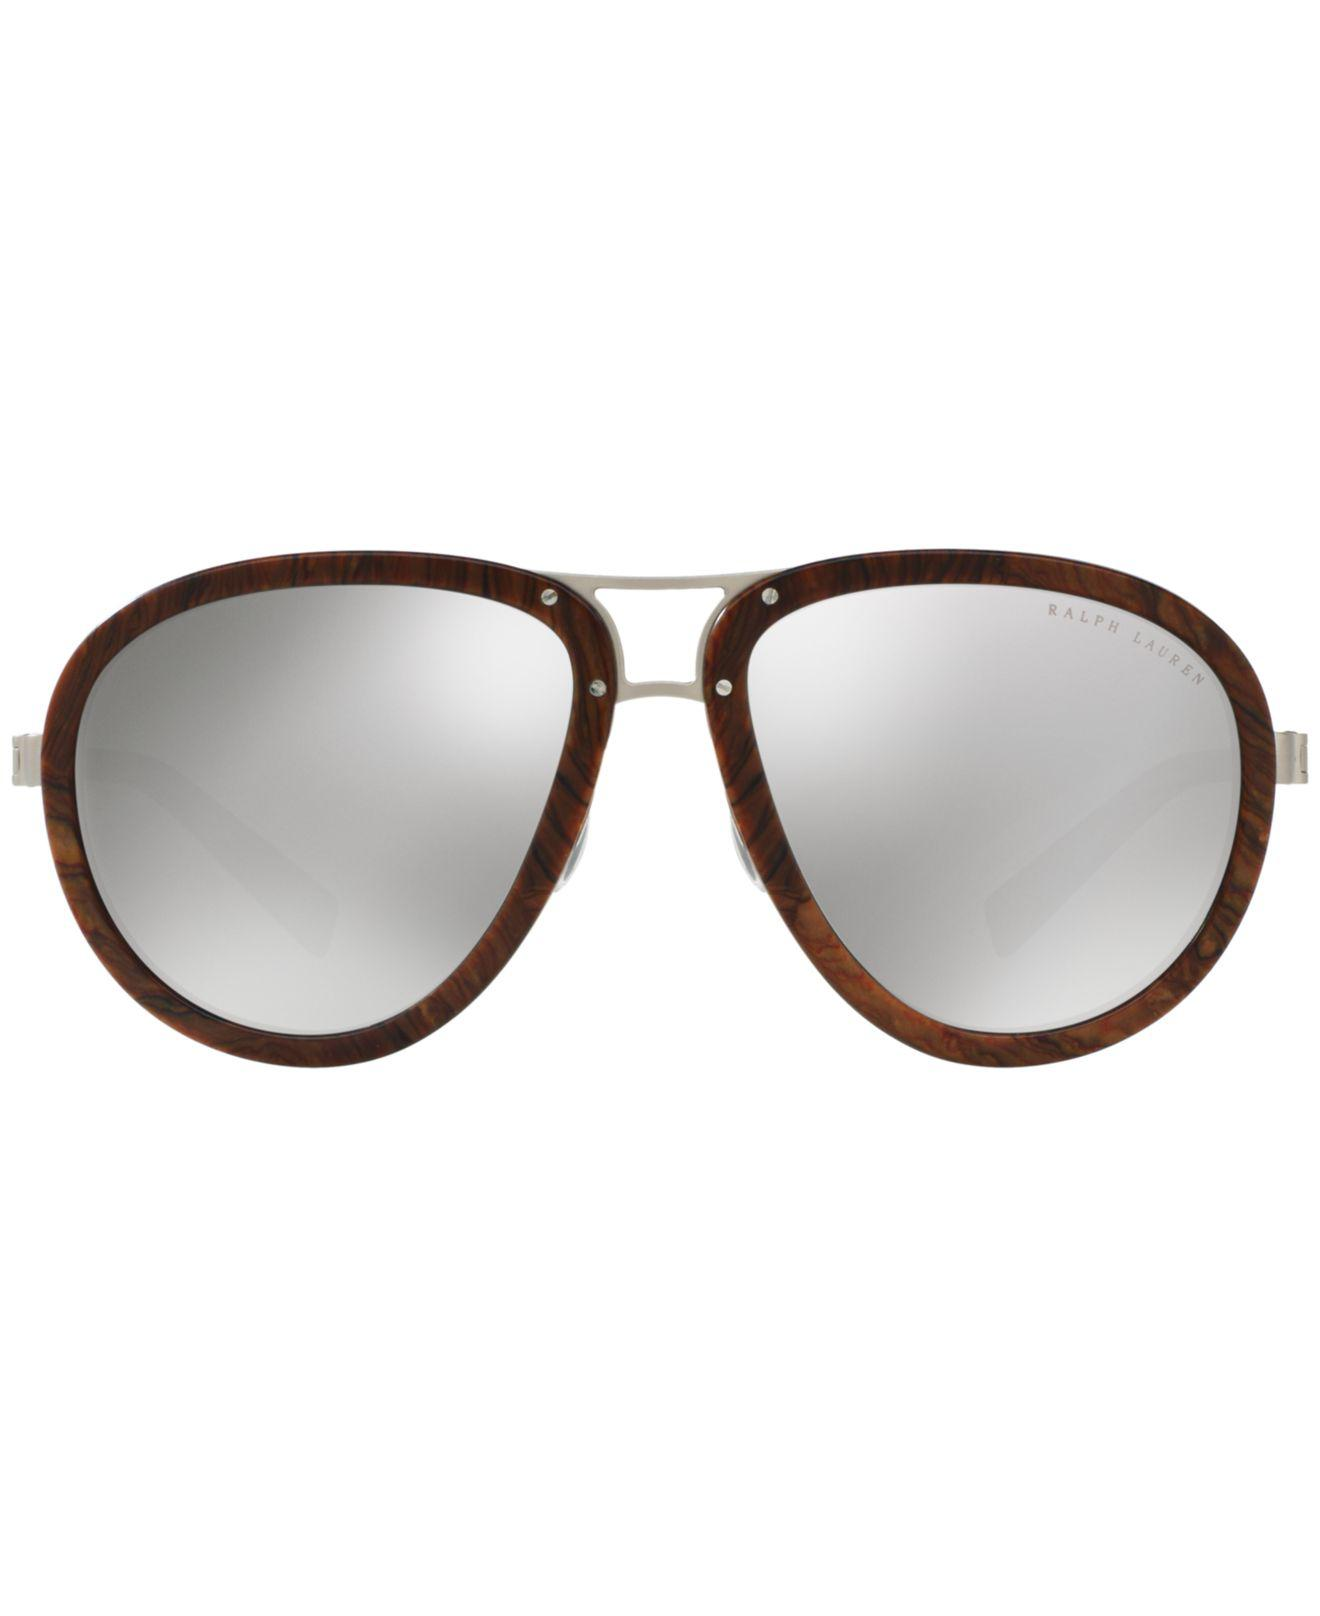 05aafb57389 ... promo code for lyst polo ralph lauren ralph lauren sunglasses rl7053  4c1bc f5a7d